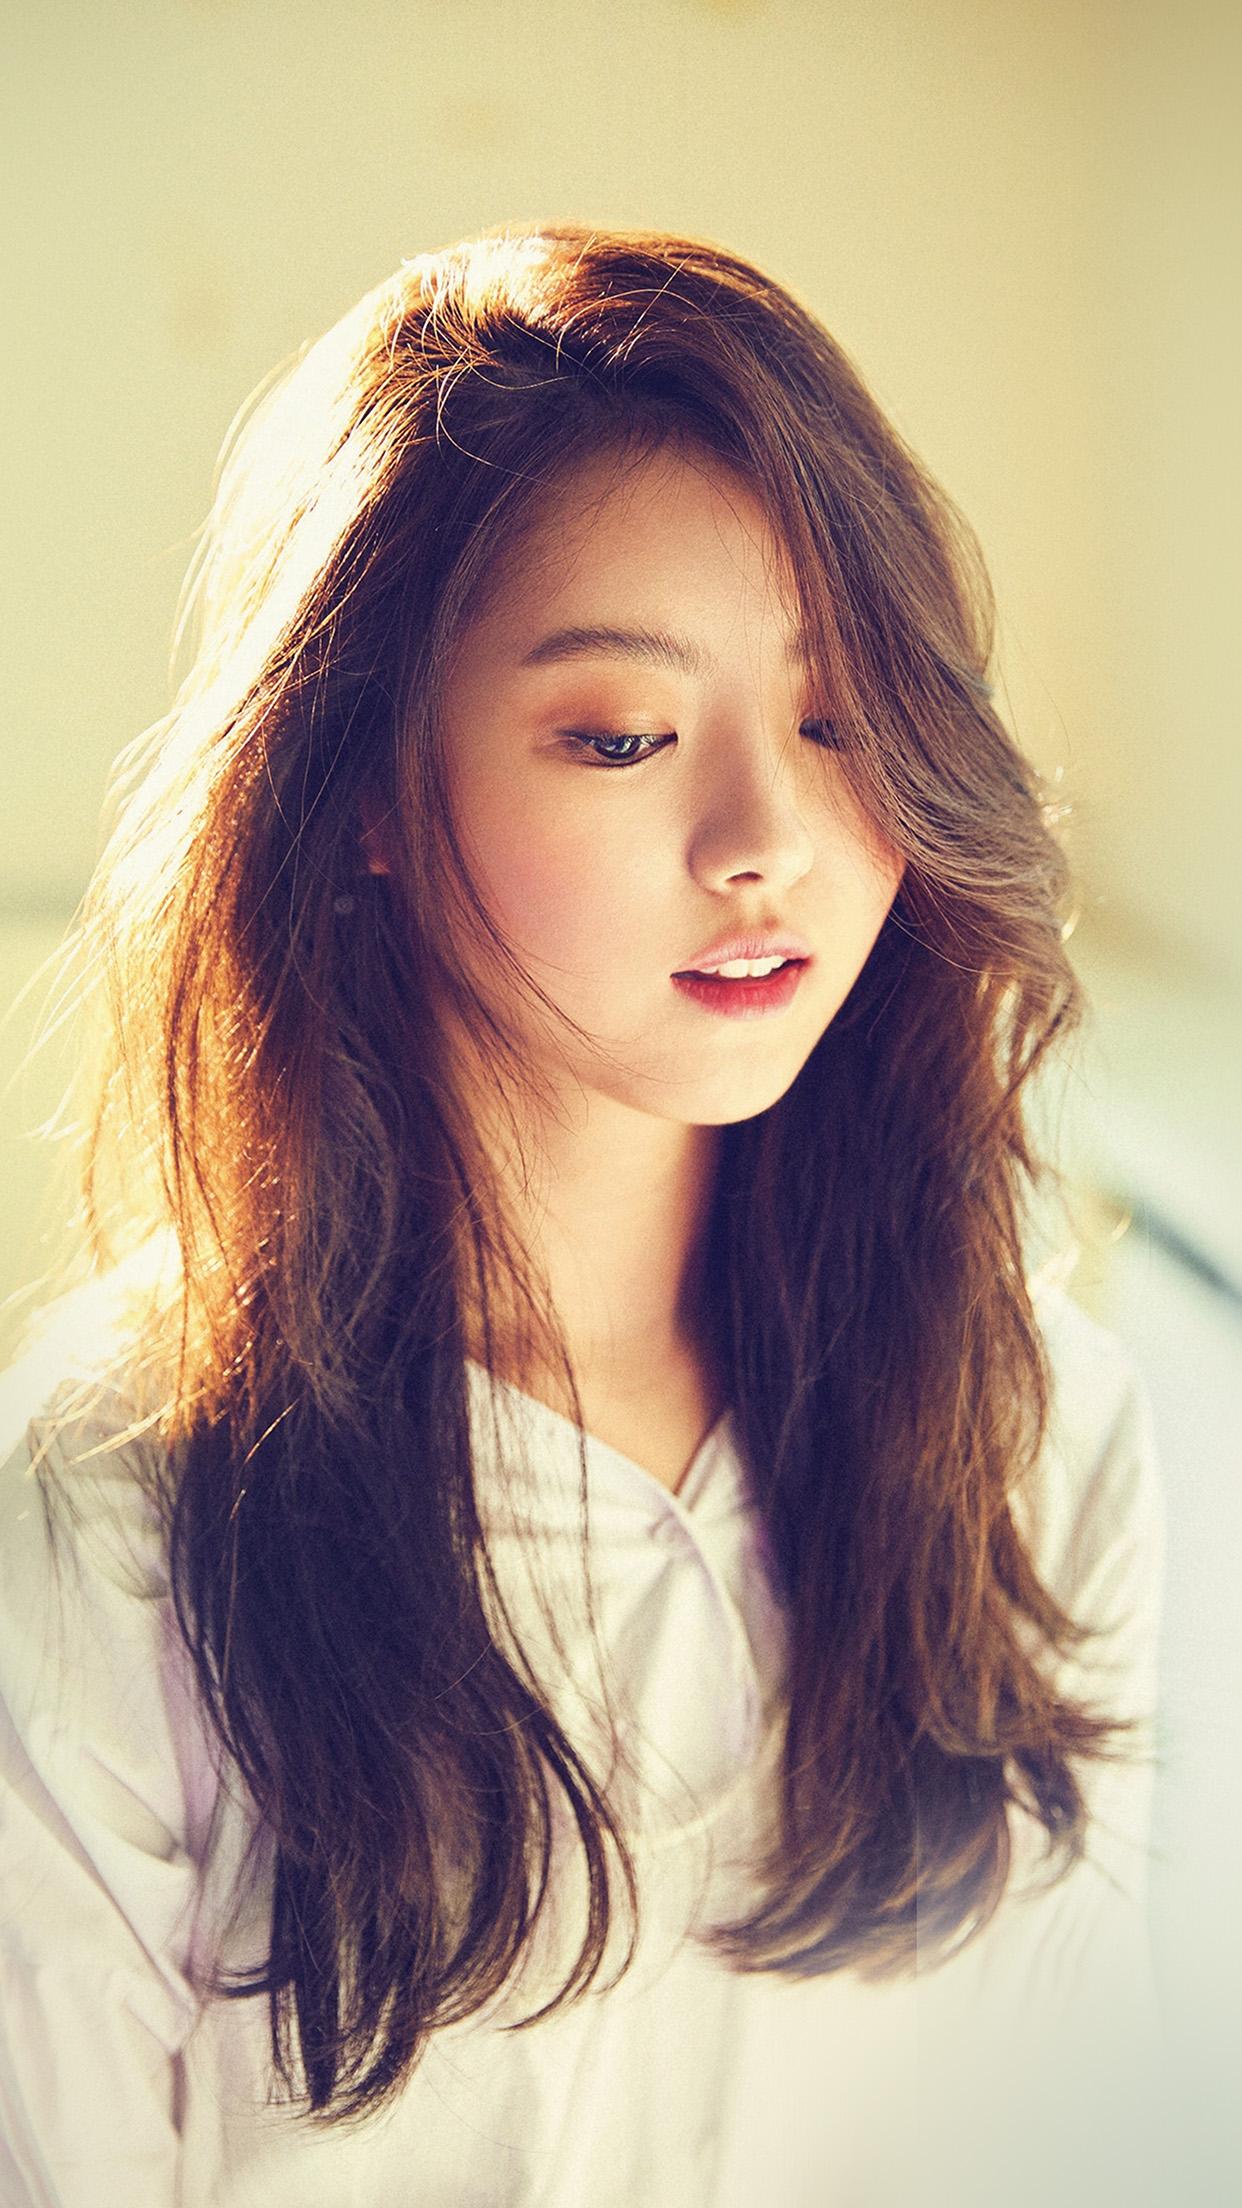 Hl31 Girl Kpop Bokeh Cute